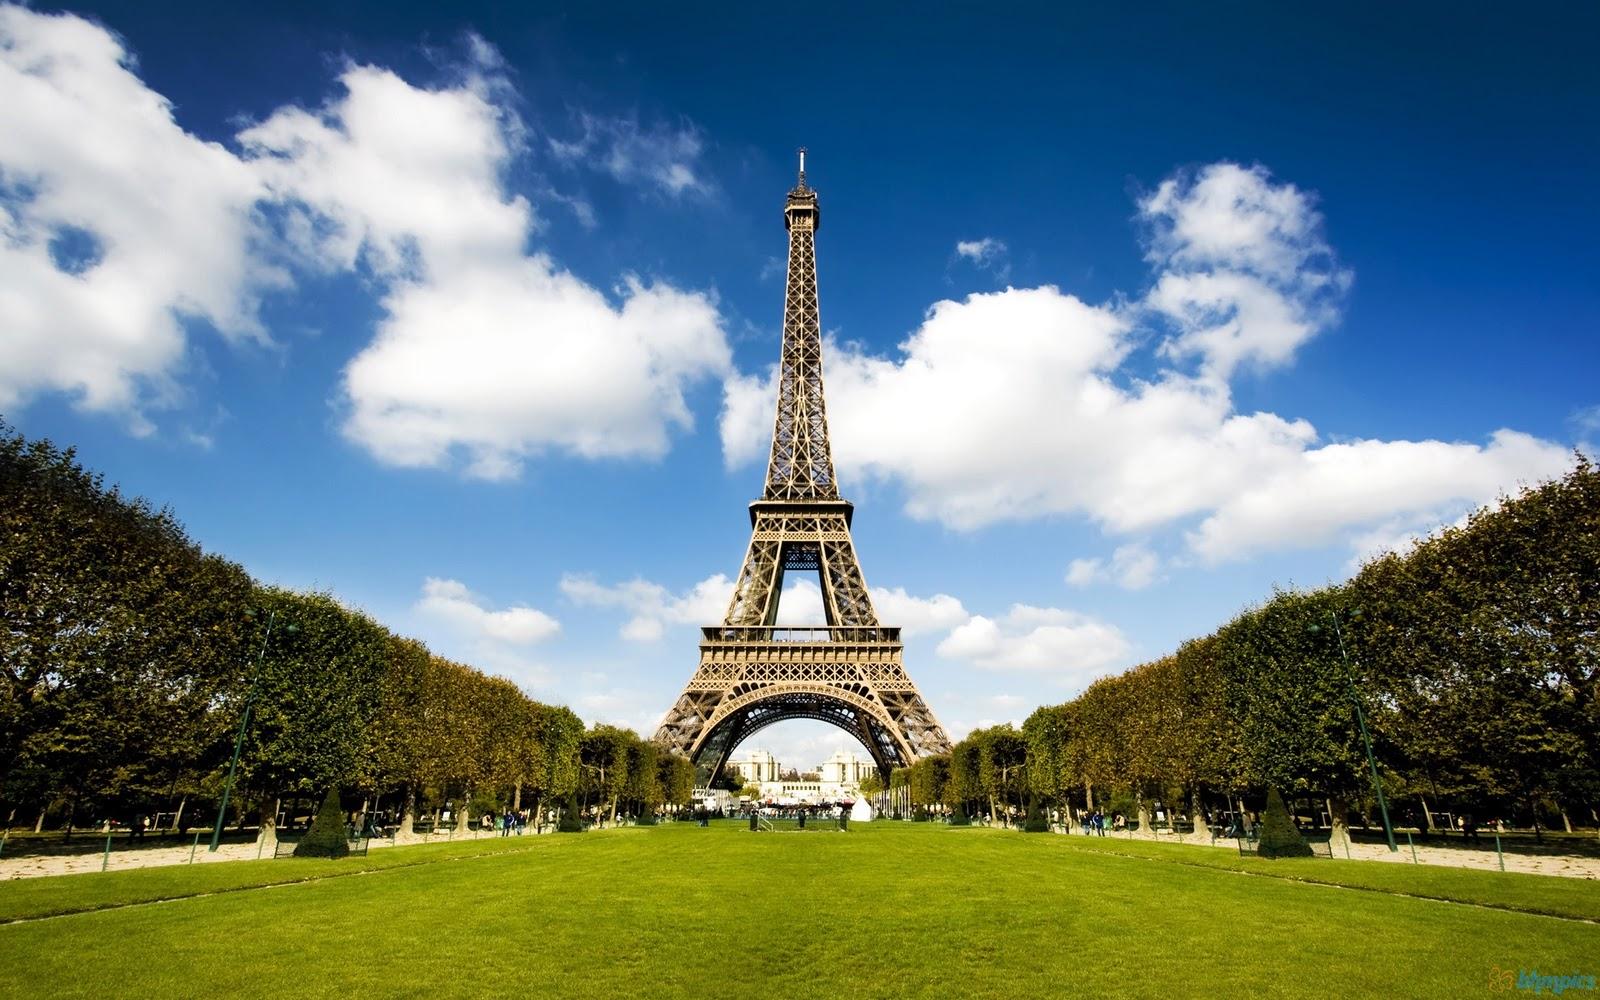 http://2.bp.blogspot.com/-OvMLF9FoGFk/TuhCfQuXILI/AAAAAAAAAfE/l2OSjdfof0Q/s1600/eiffel_tower_in_france-1920x1200.jpg